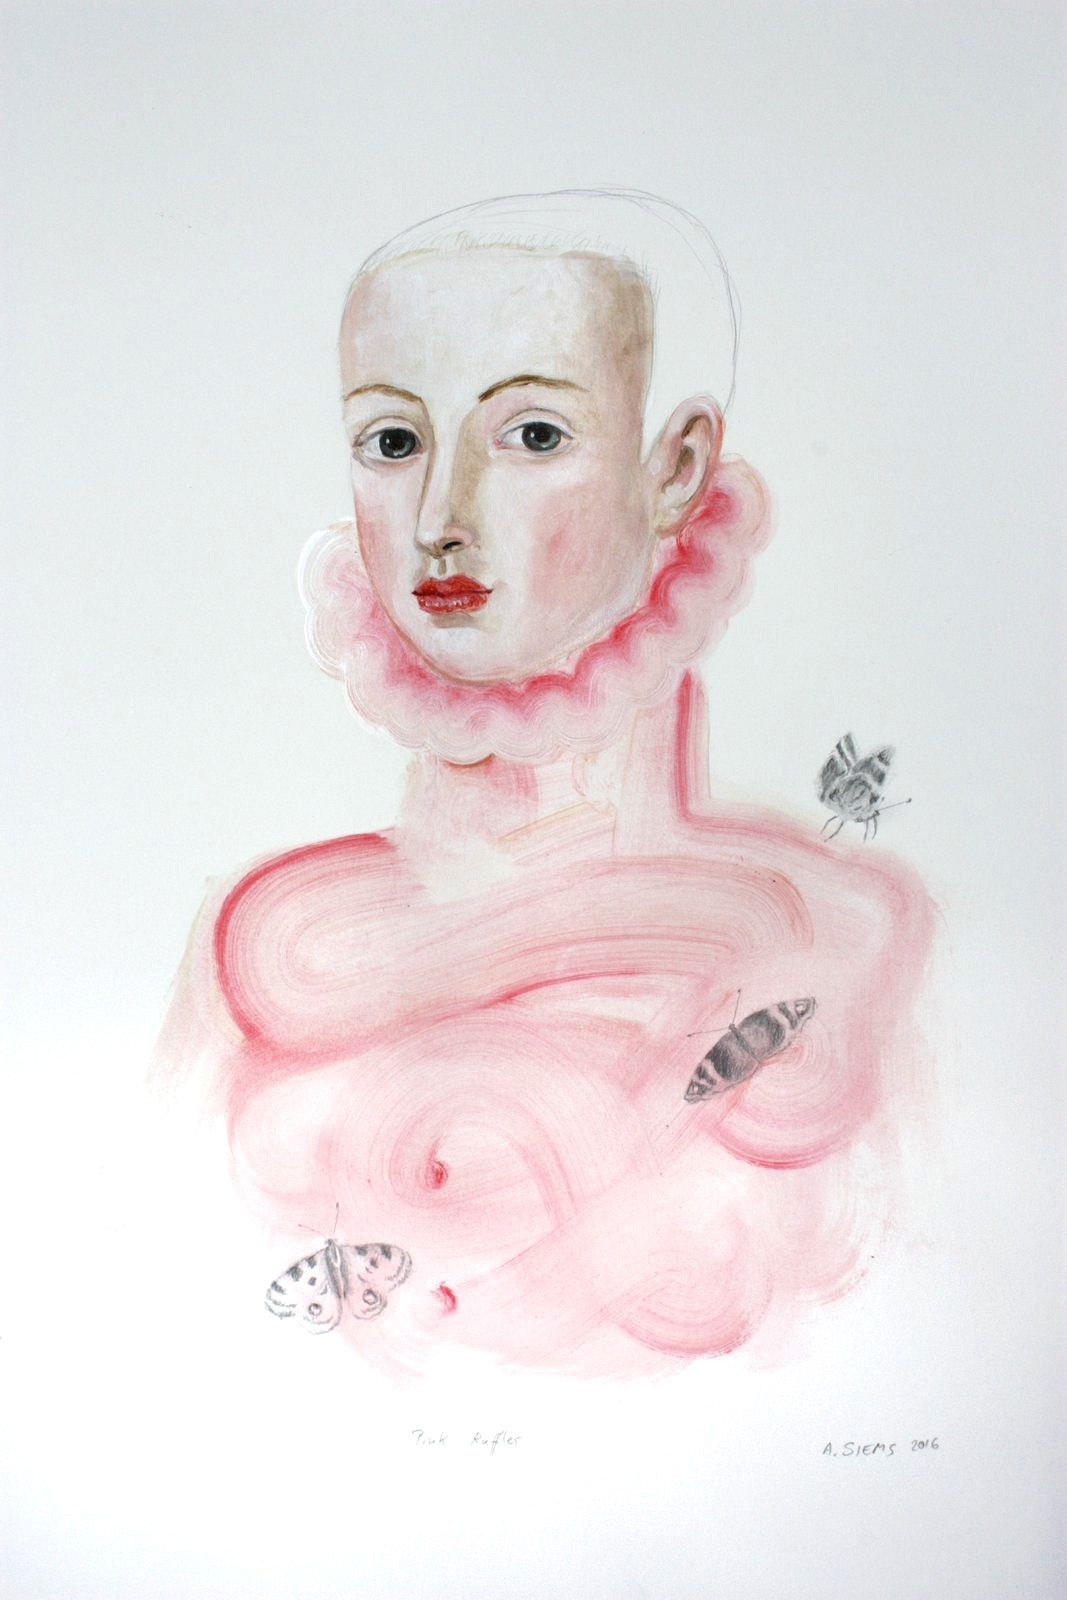 Siems - Pink Ruffles Drawing